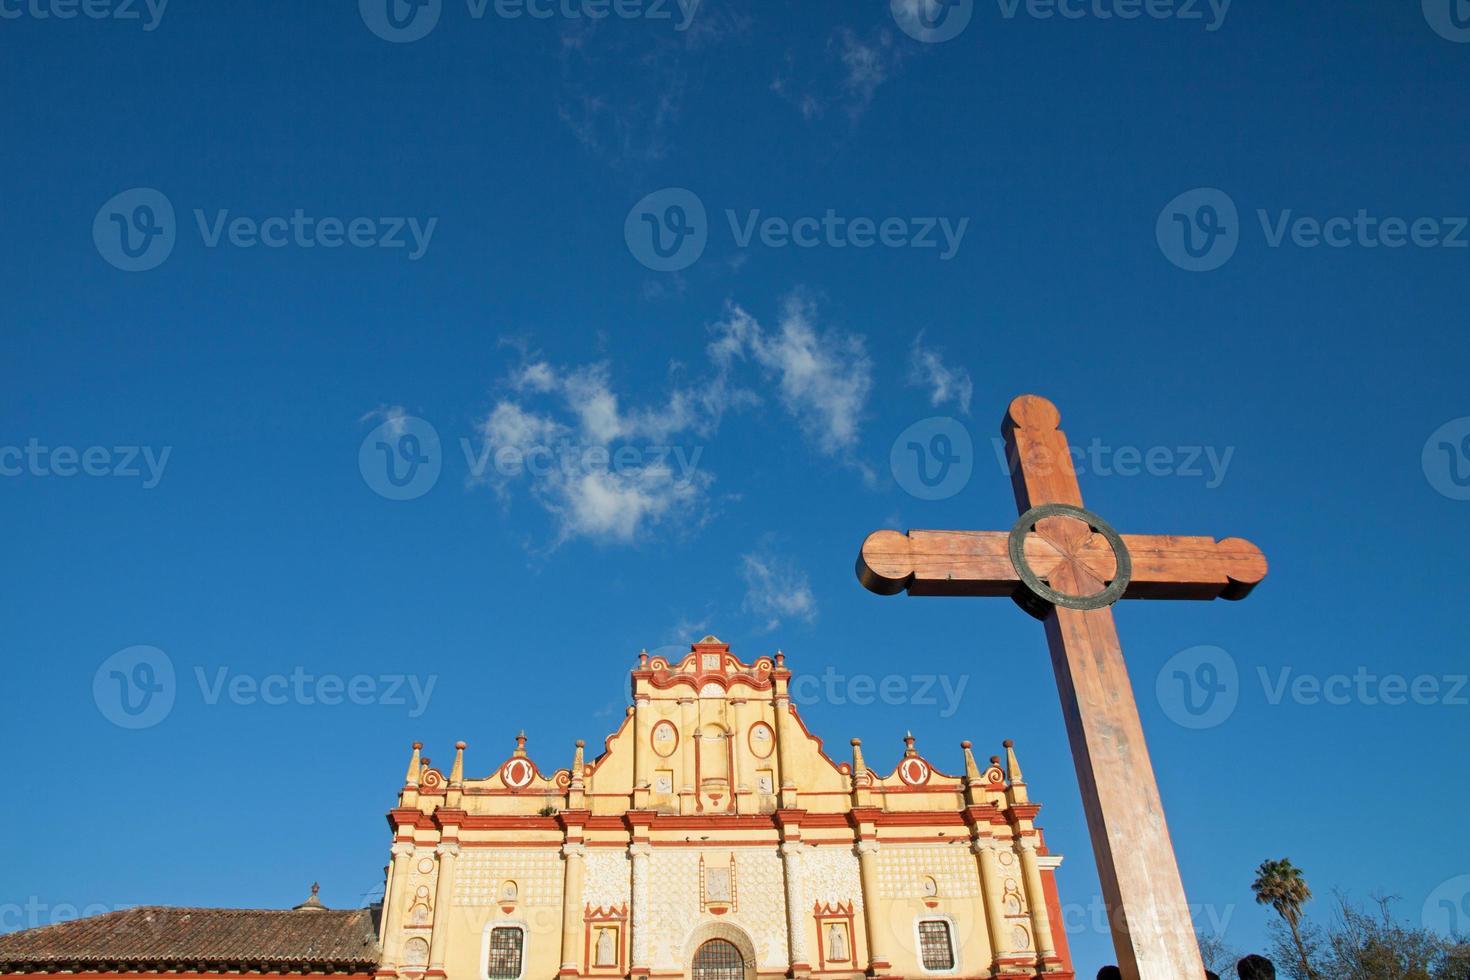 kathedraal van san cristobal, chiapas, mexico foto